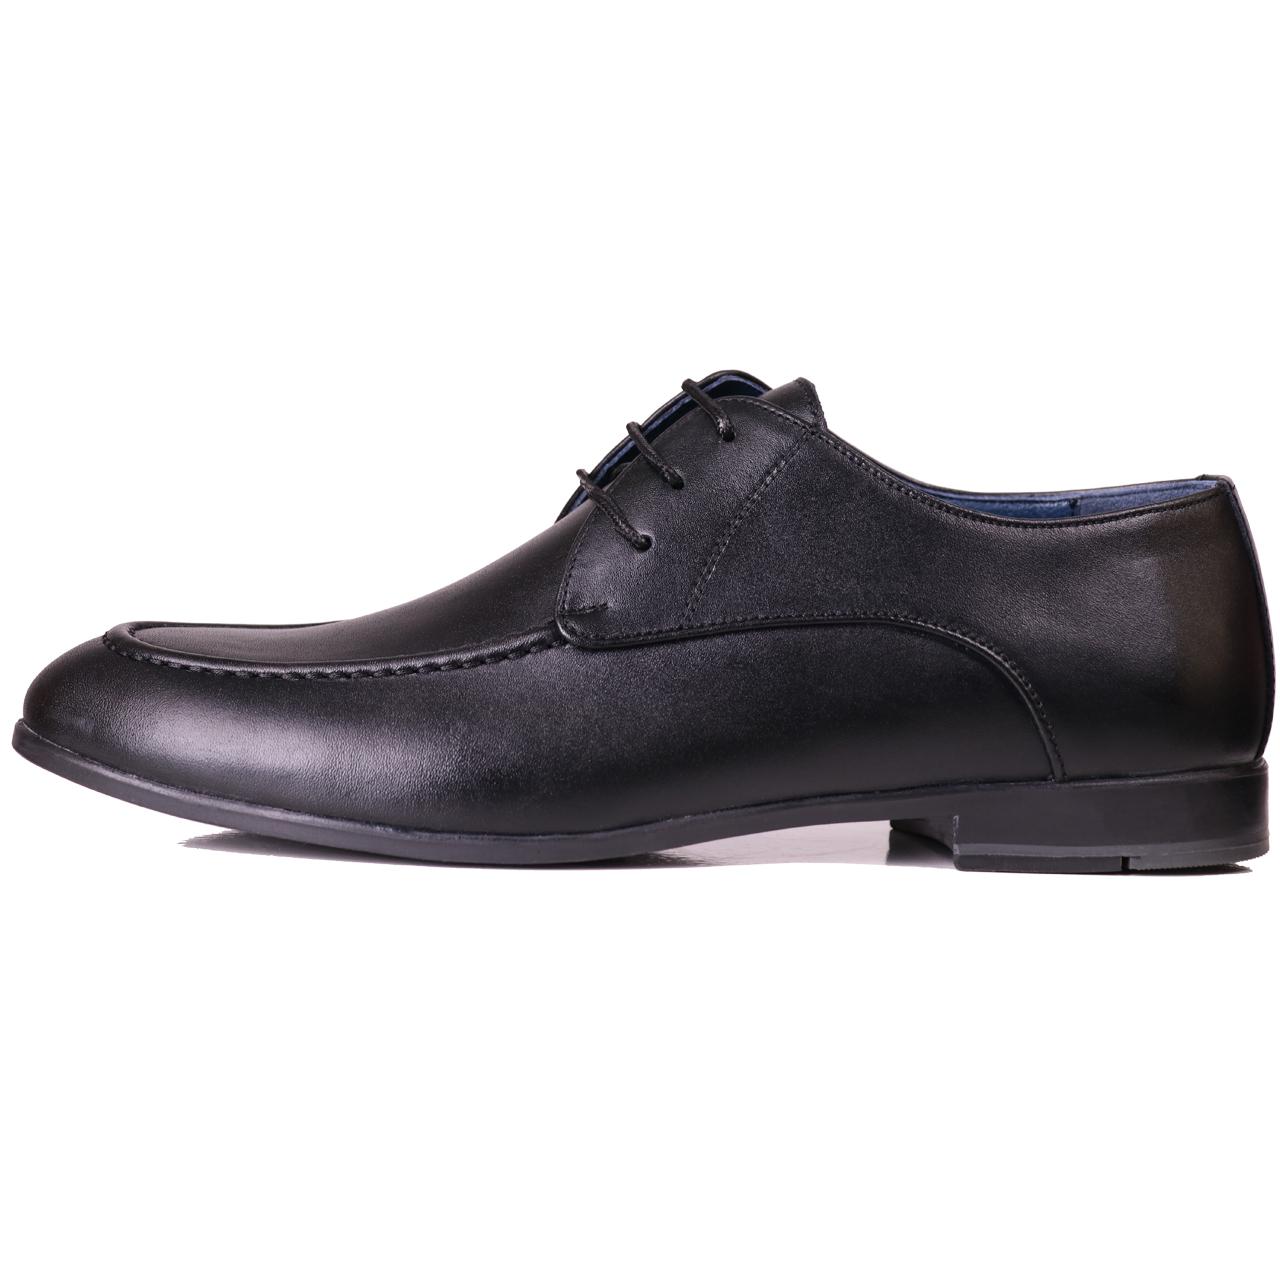 کفش مردانه چرم طبیعی ژست مدل 3121